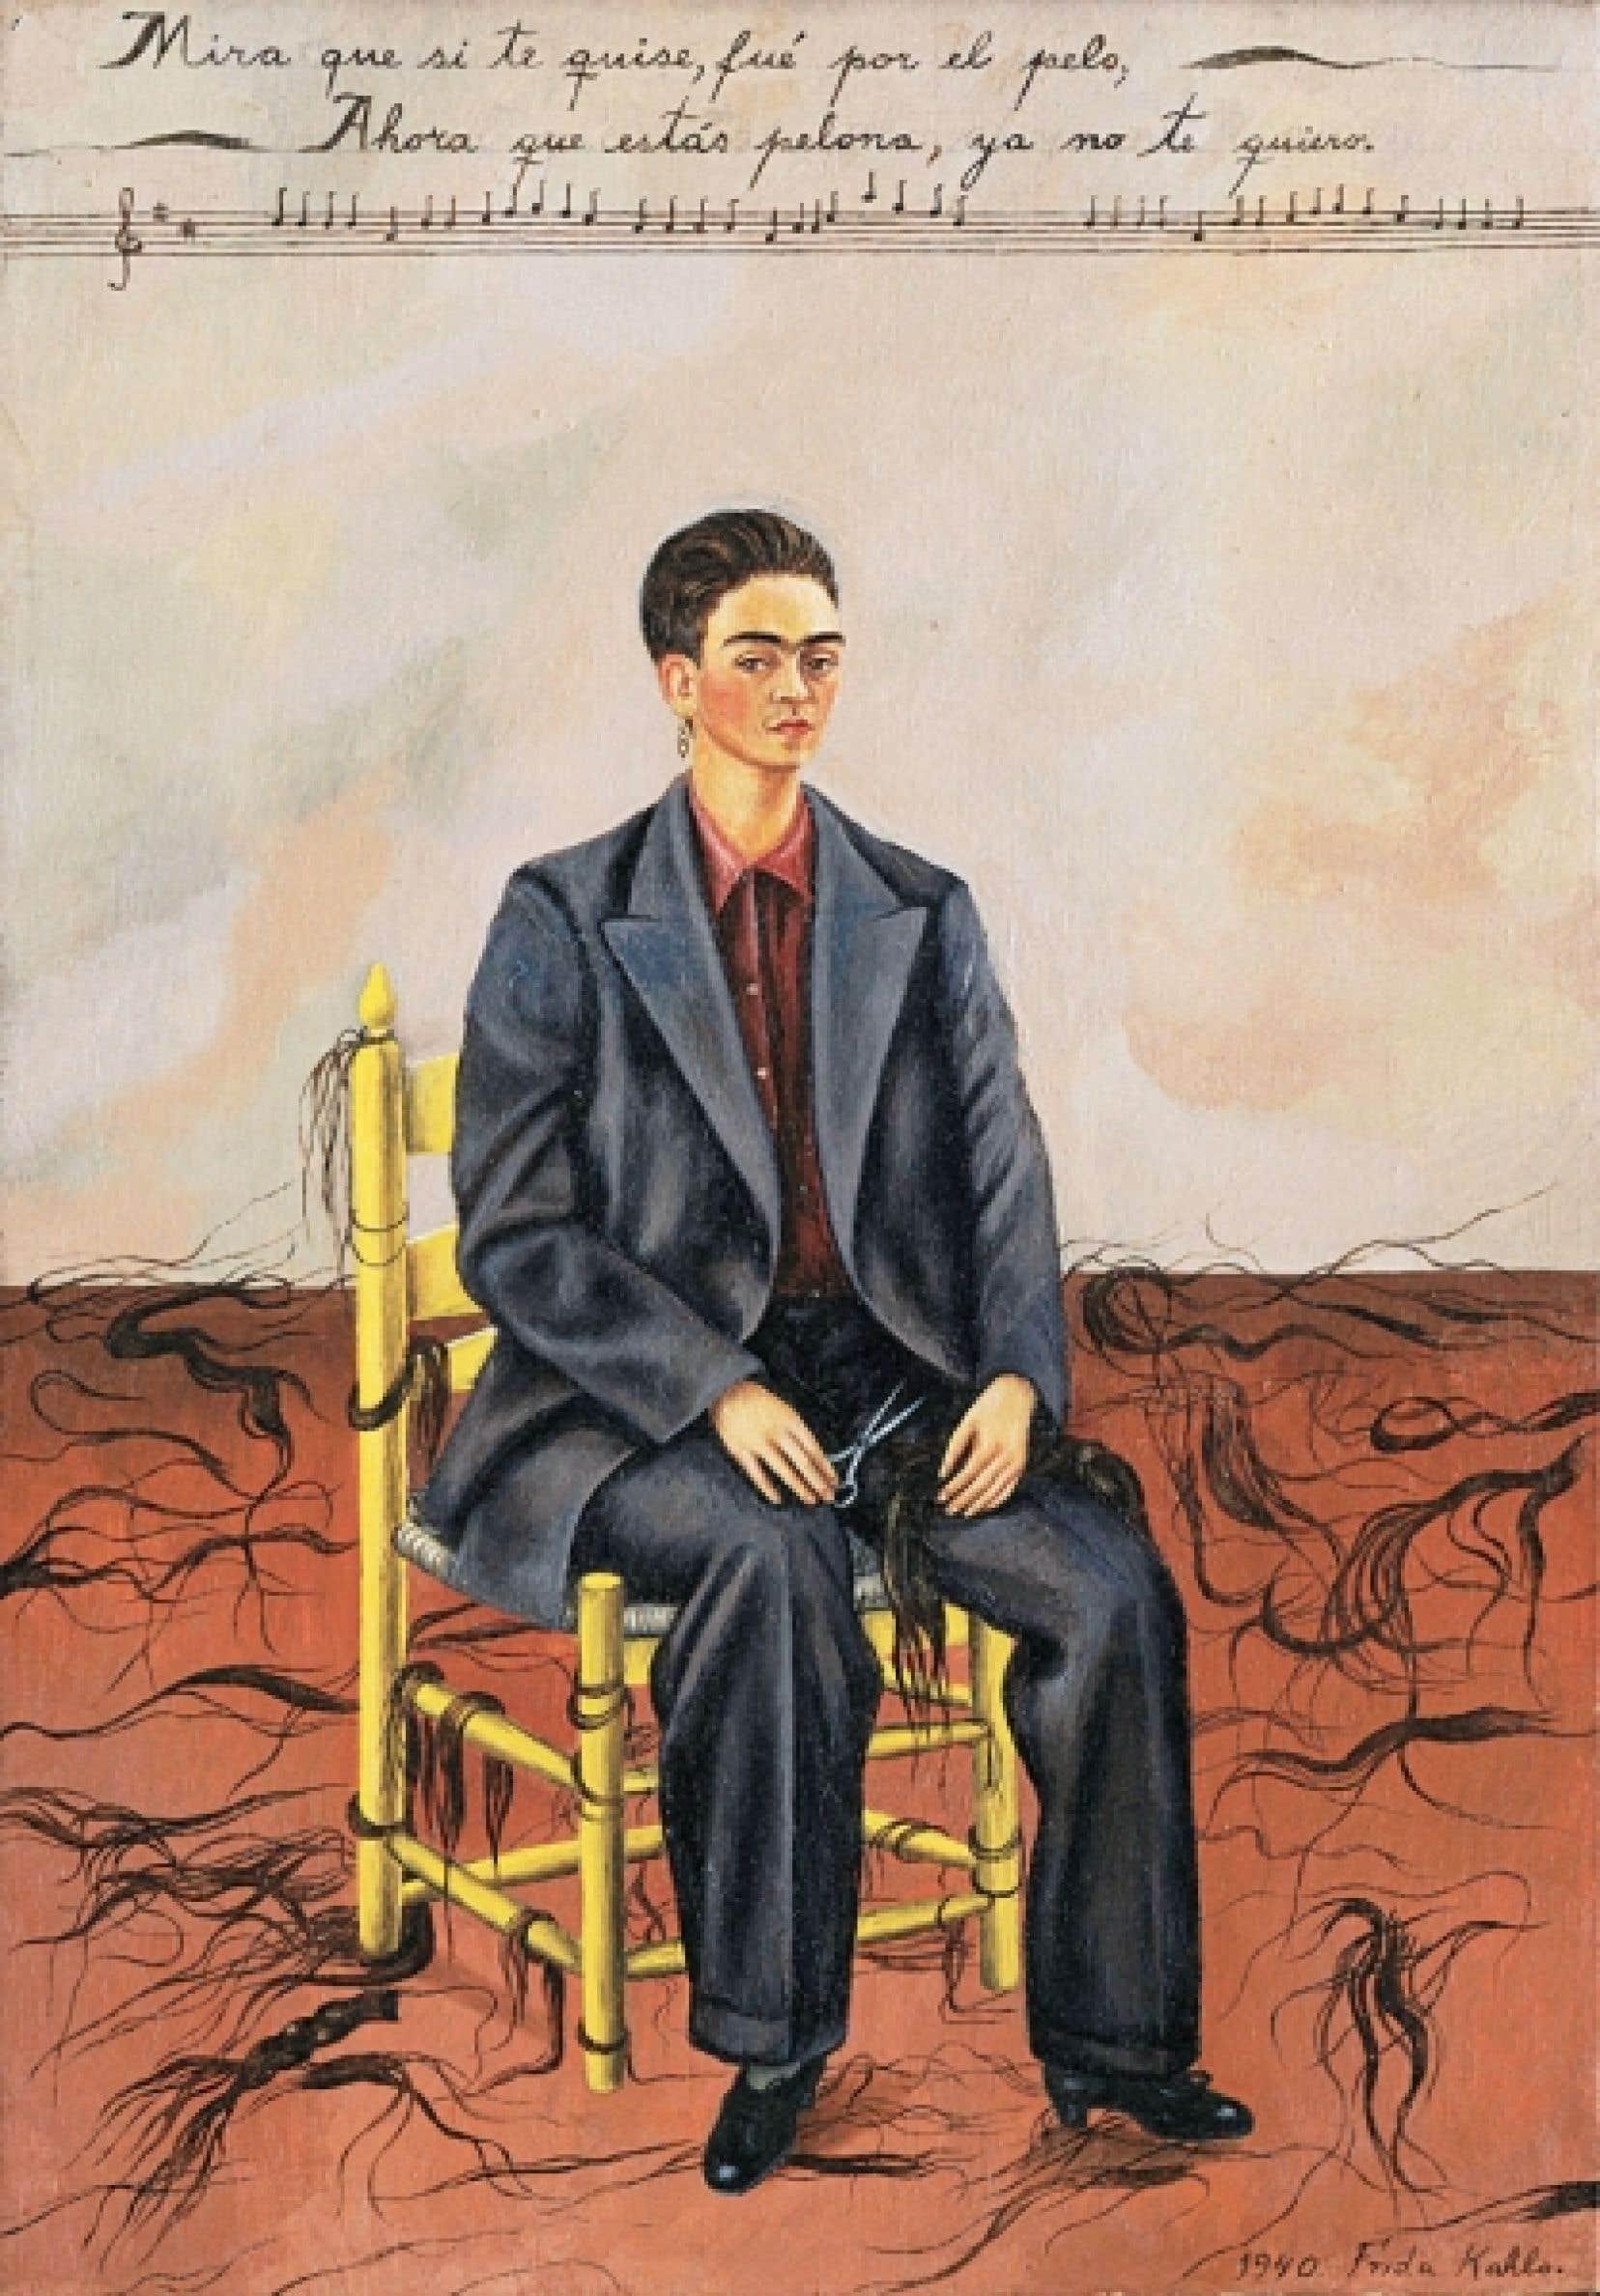 Autorretrato con pelo cortado (autoportrait avec cheveux courts), Frida Kahlo (1940)